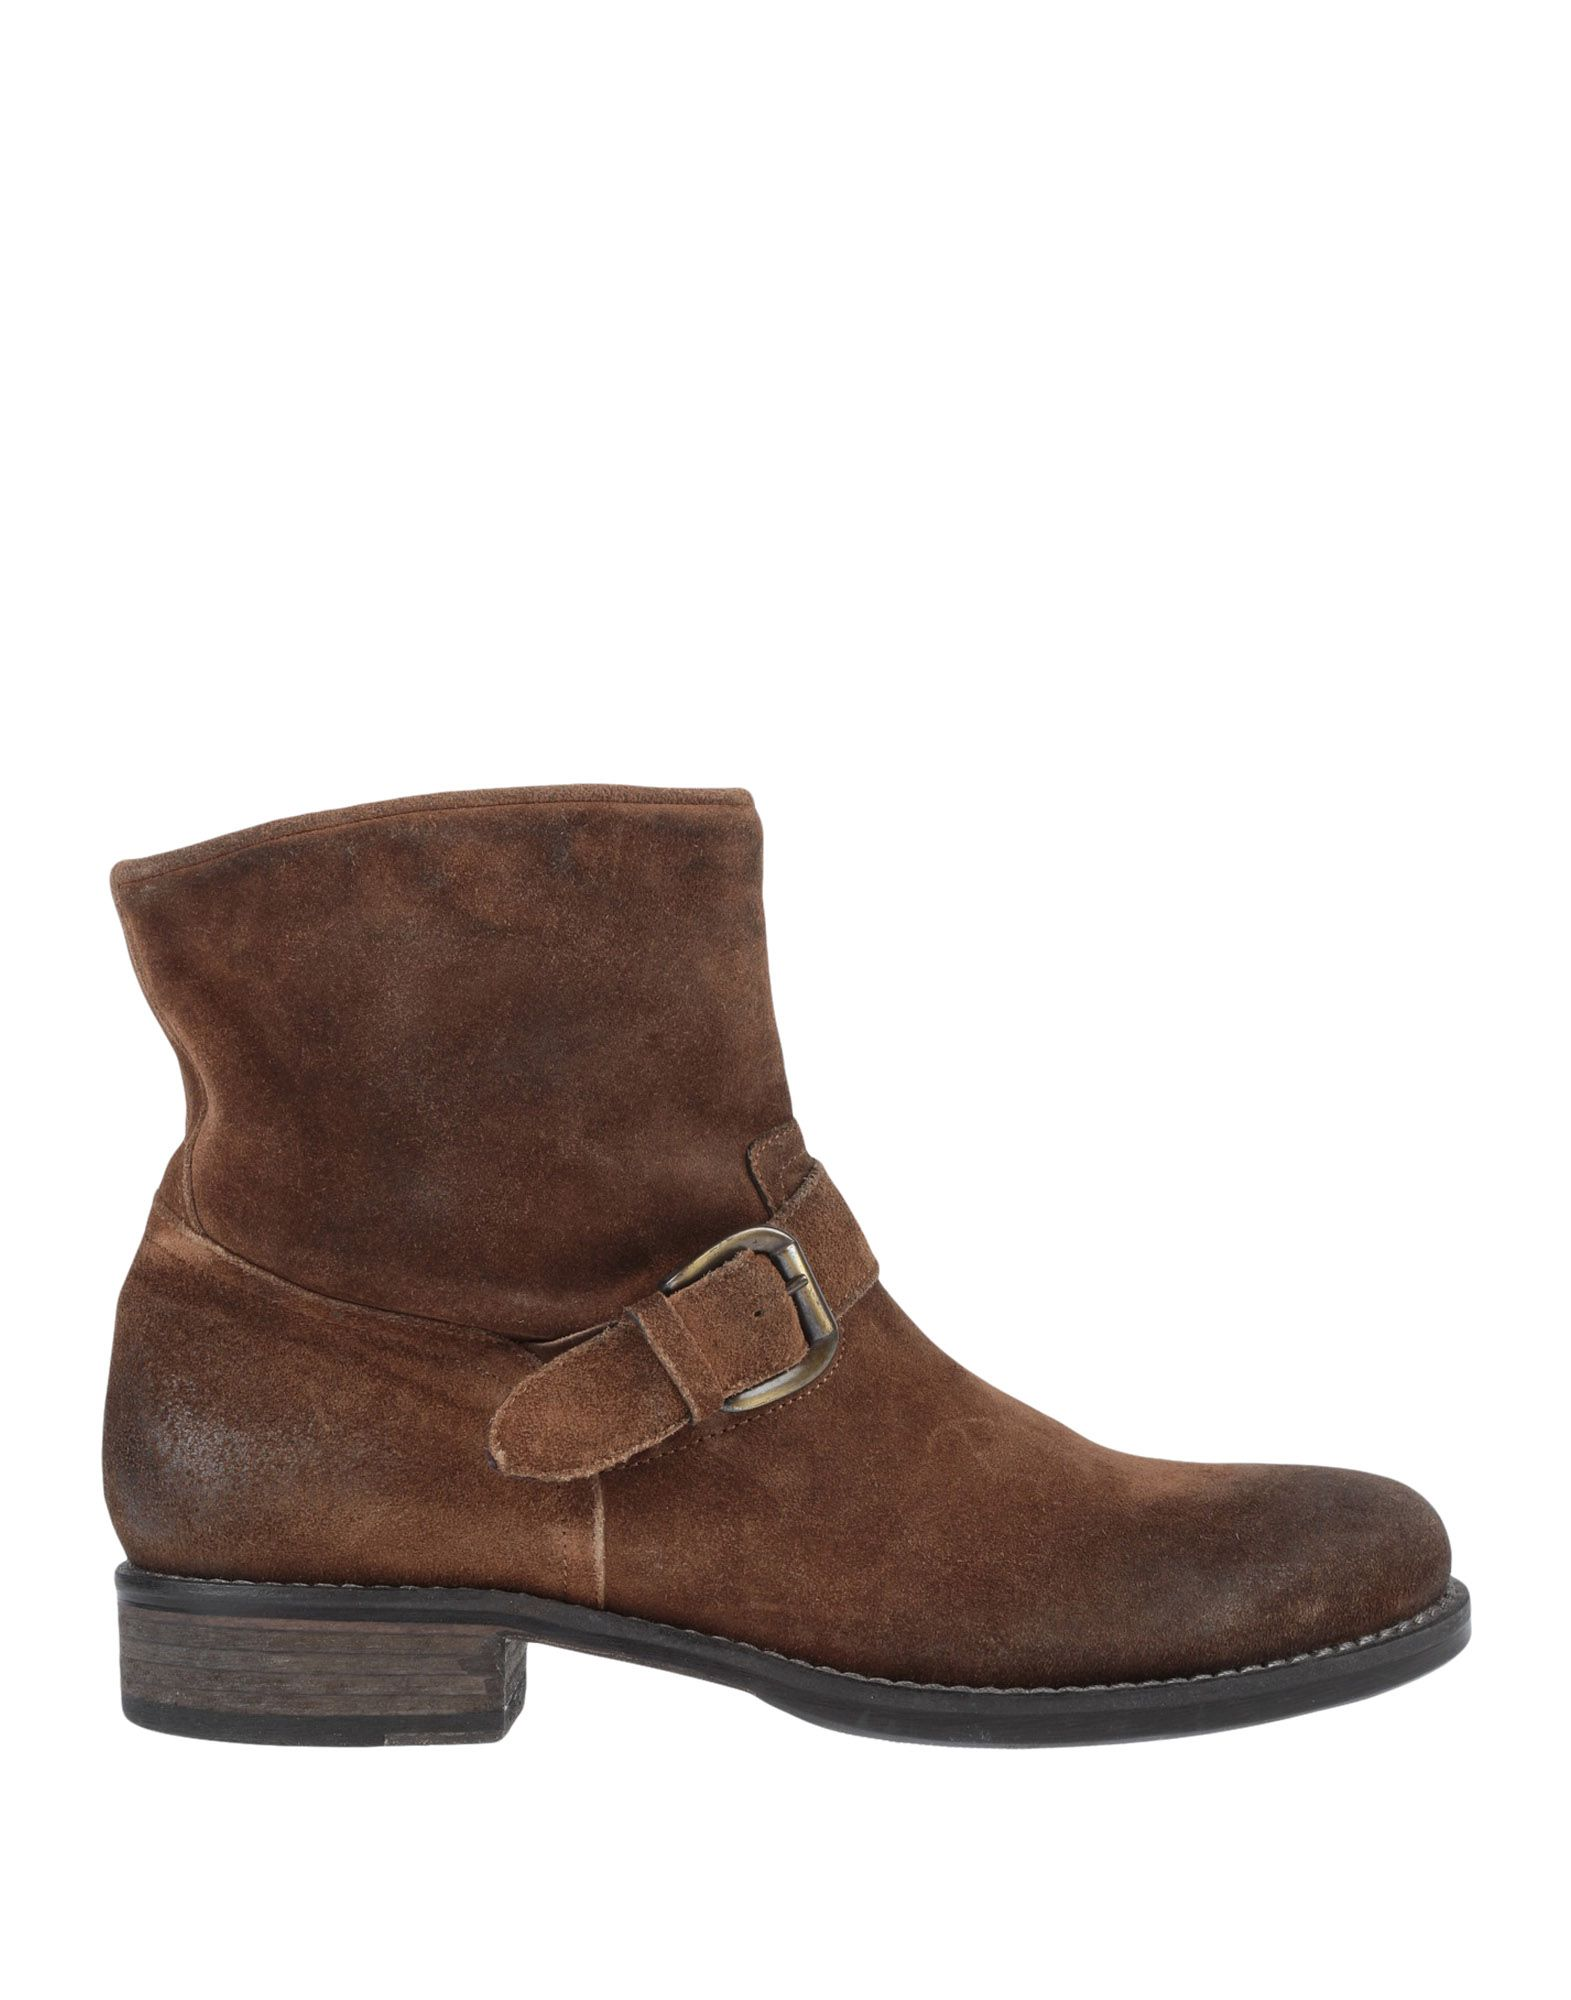 Stilvolle billige Schuhe Jfk Stiefelette Damen  11522779SE